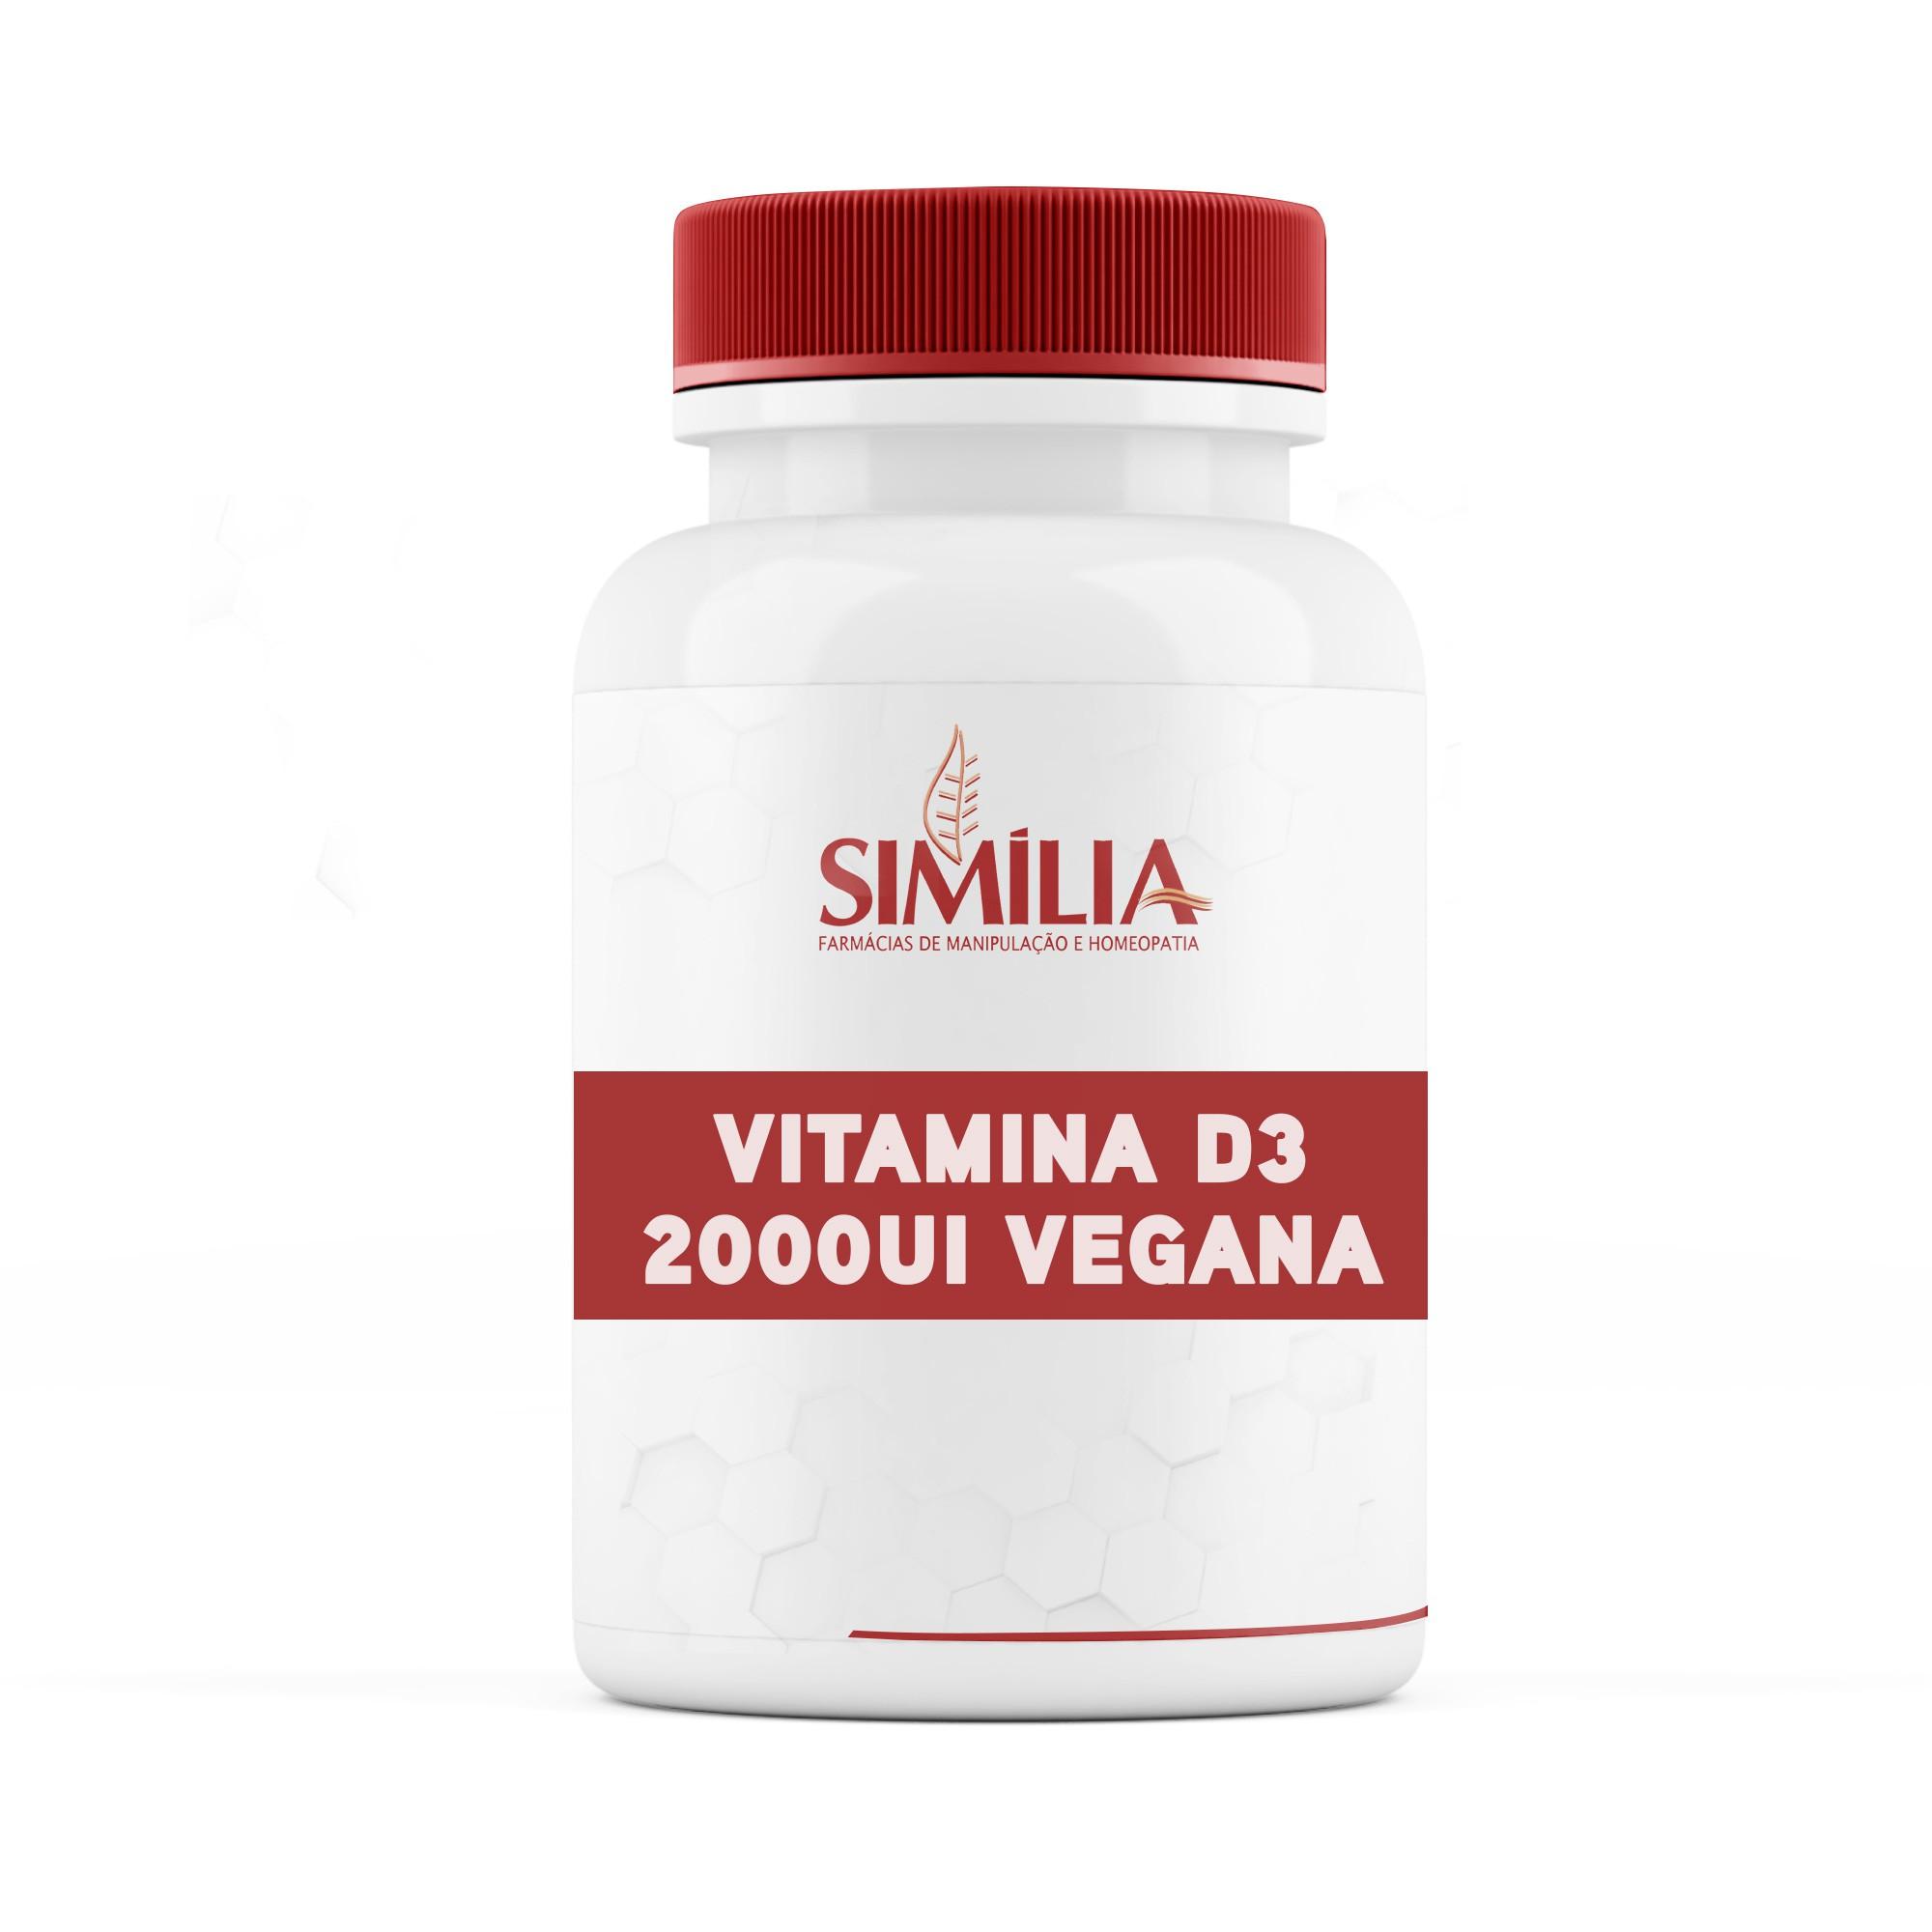 Vitamina D3 2000ui Vegana - 30 cápsulas